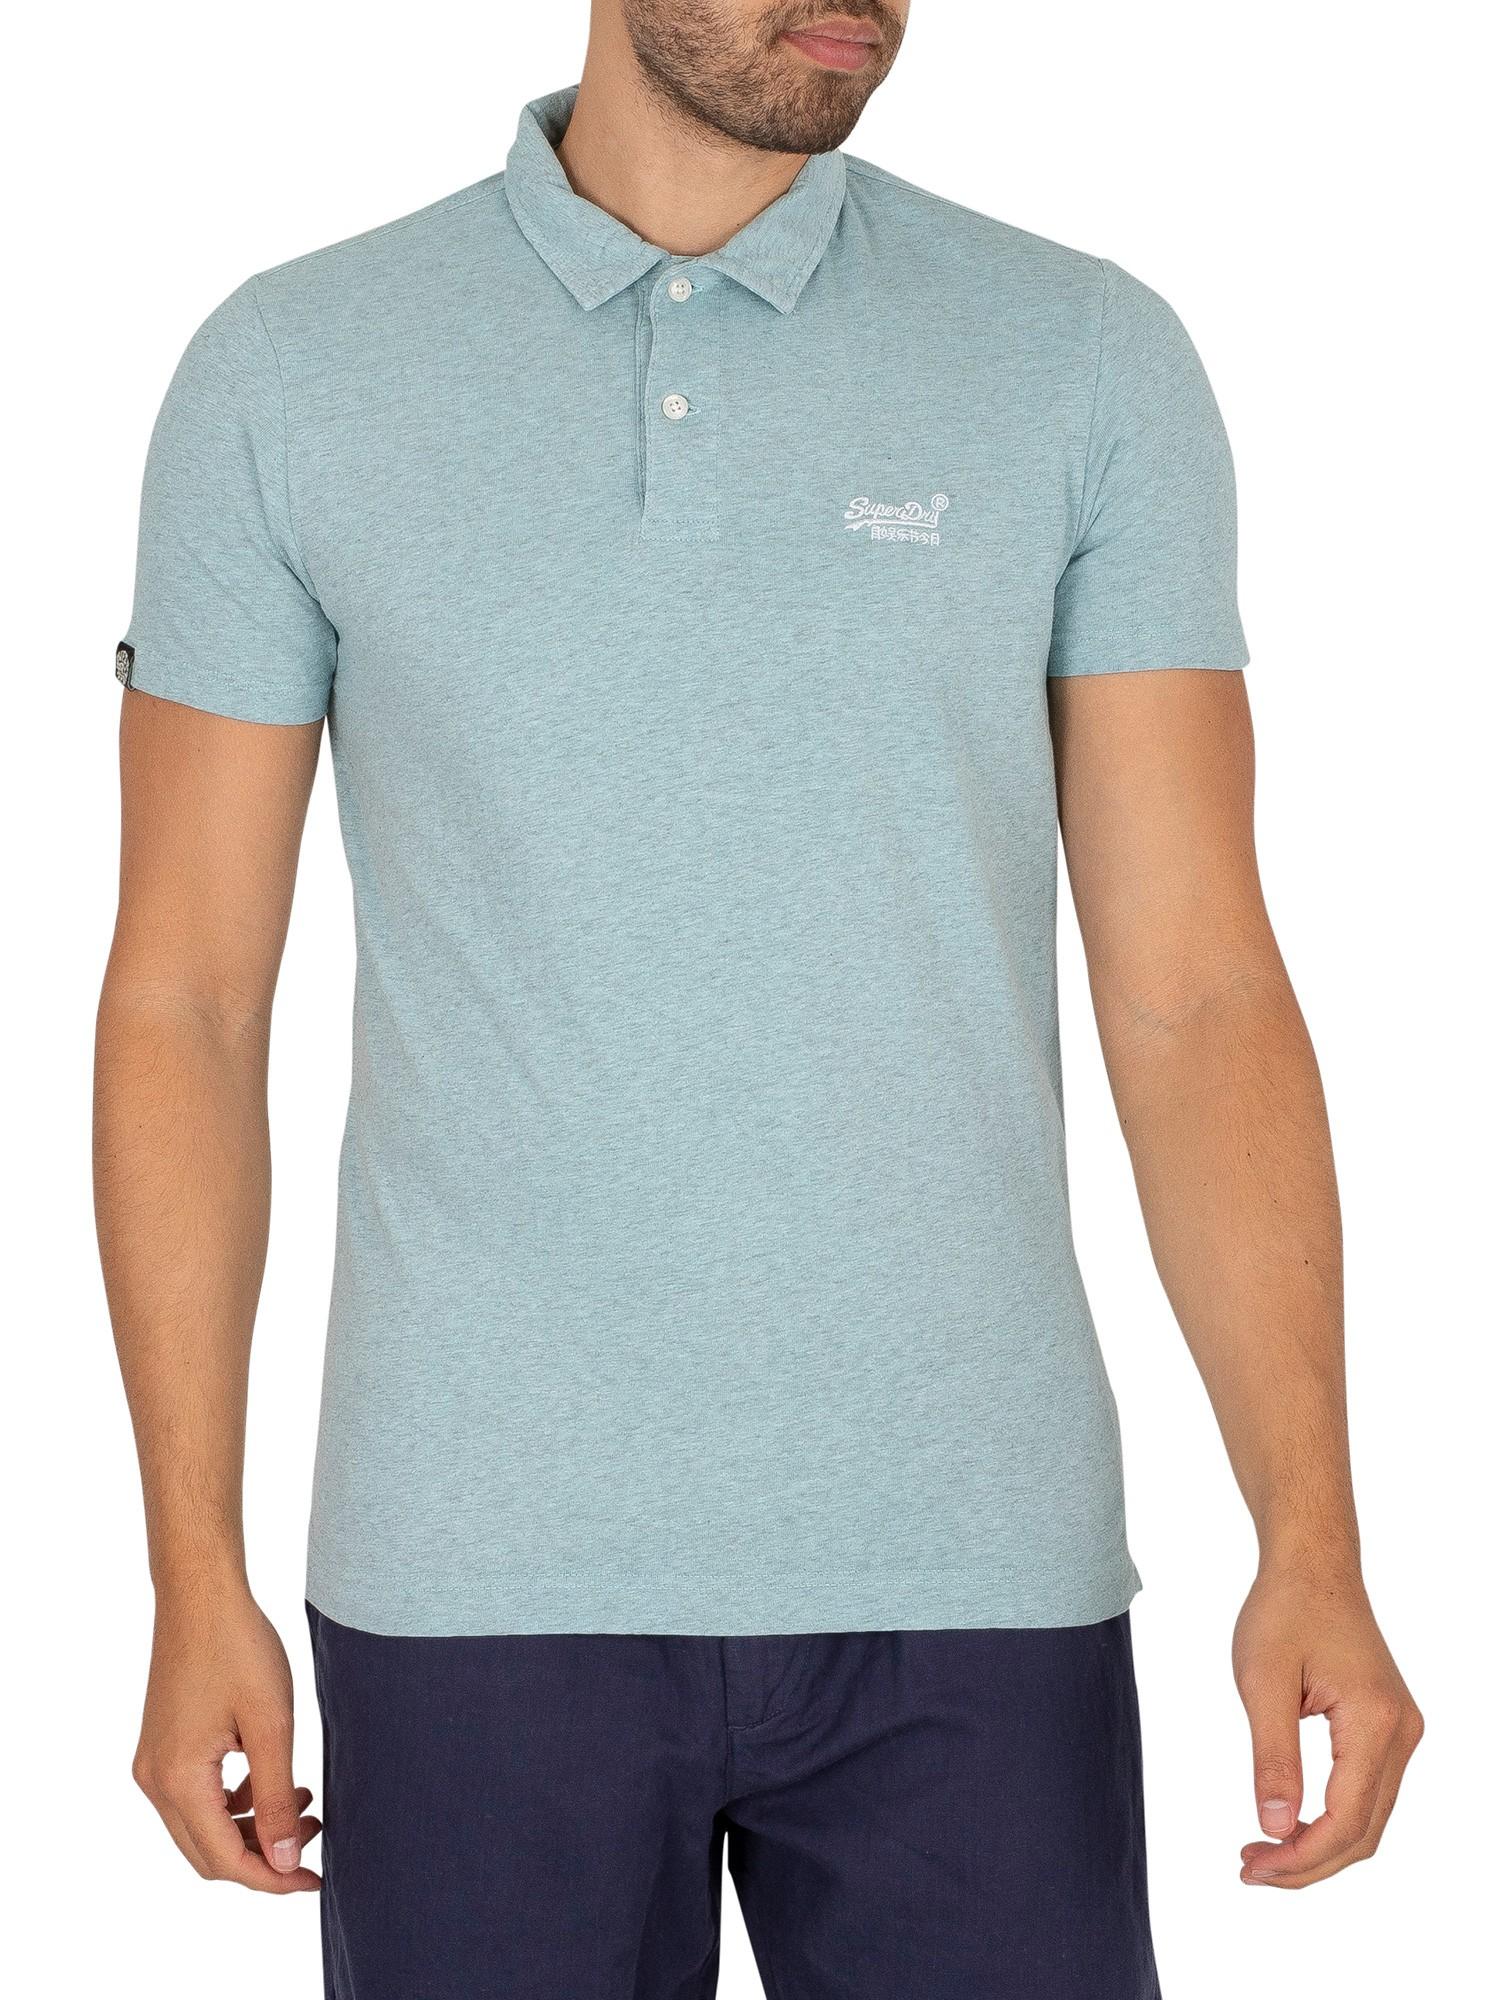 LA-Beach-Jersey-Polo-Shirt